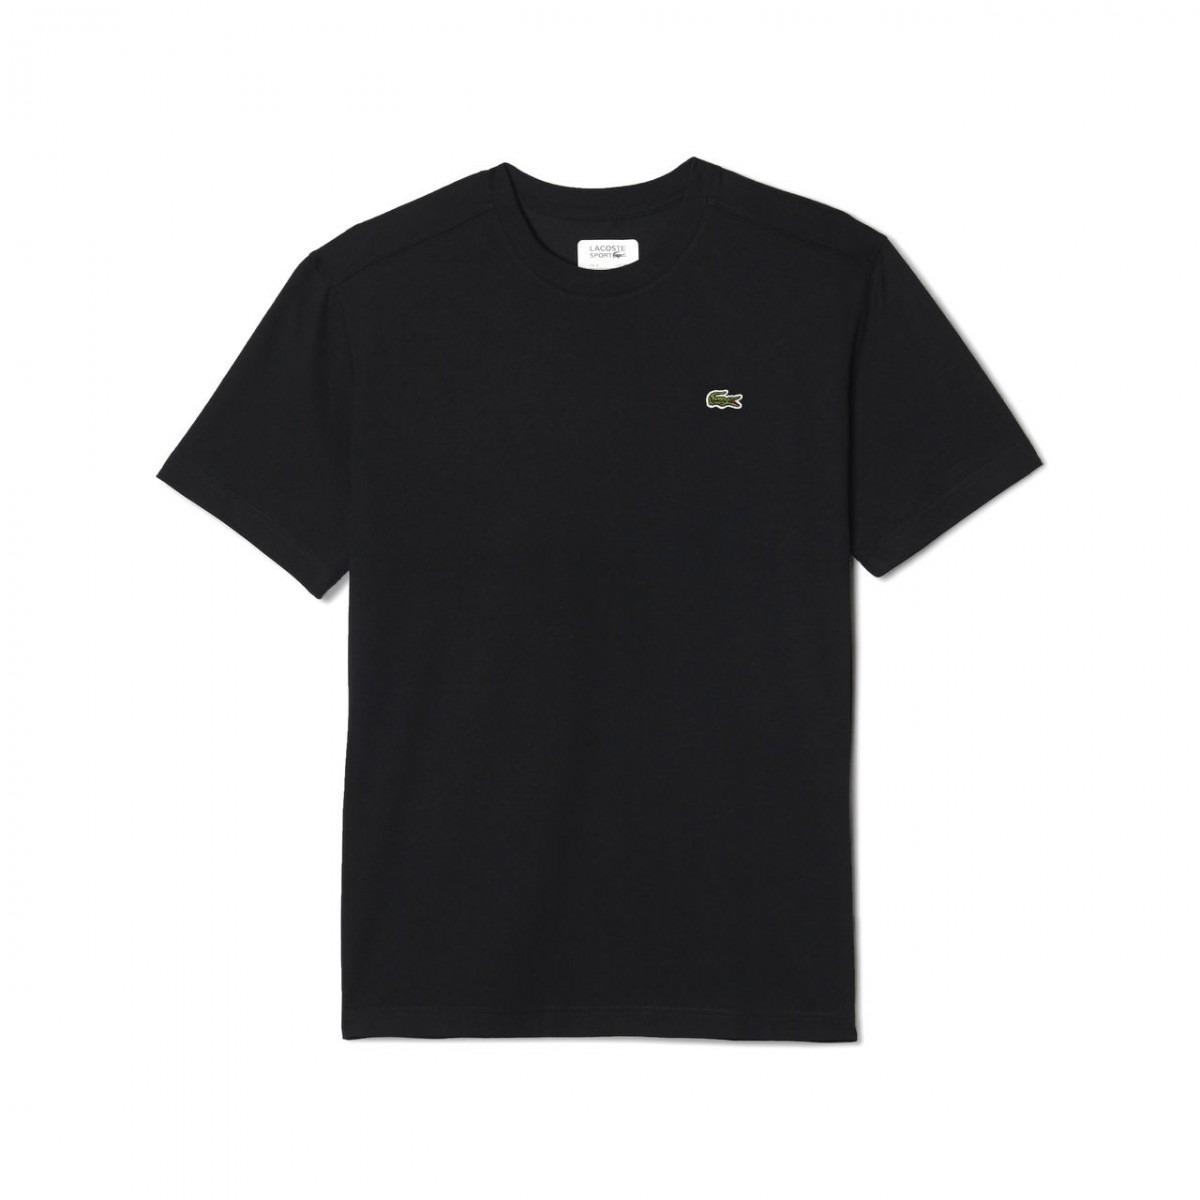 fe850cb981756 camiseta lacoste masculina original básica th761821 m  curta. Carregando  zoom.